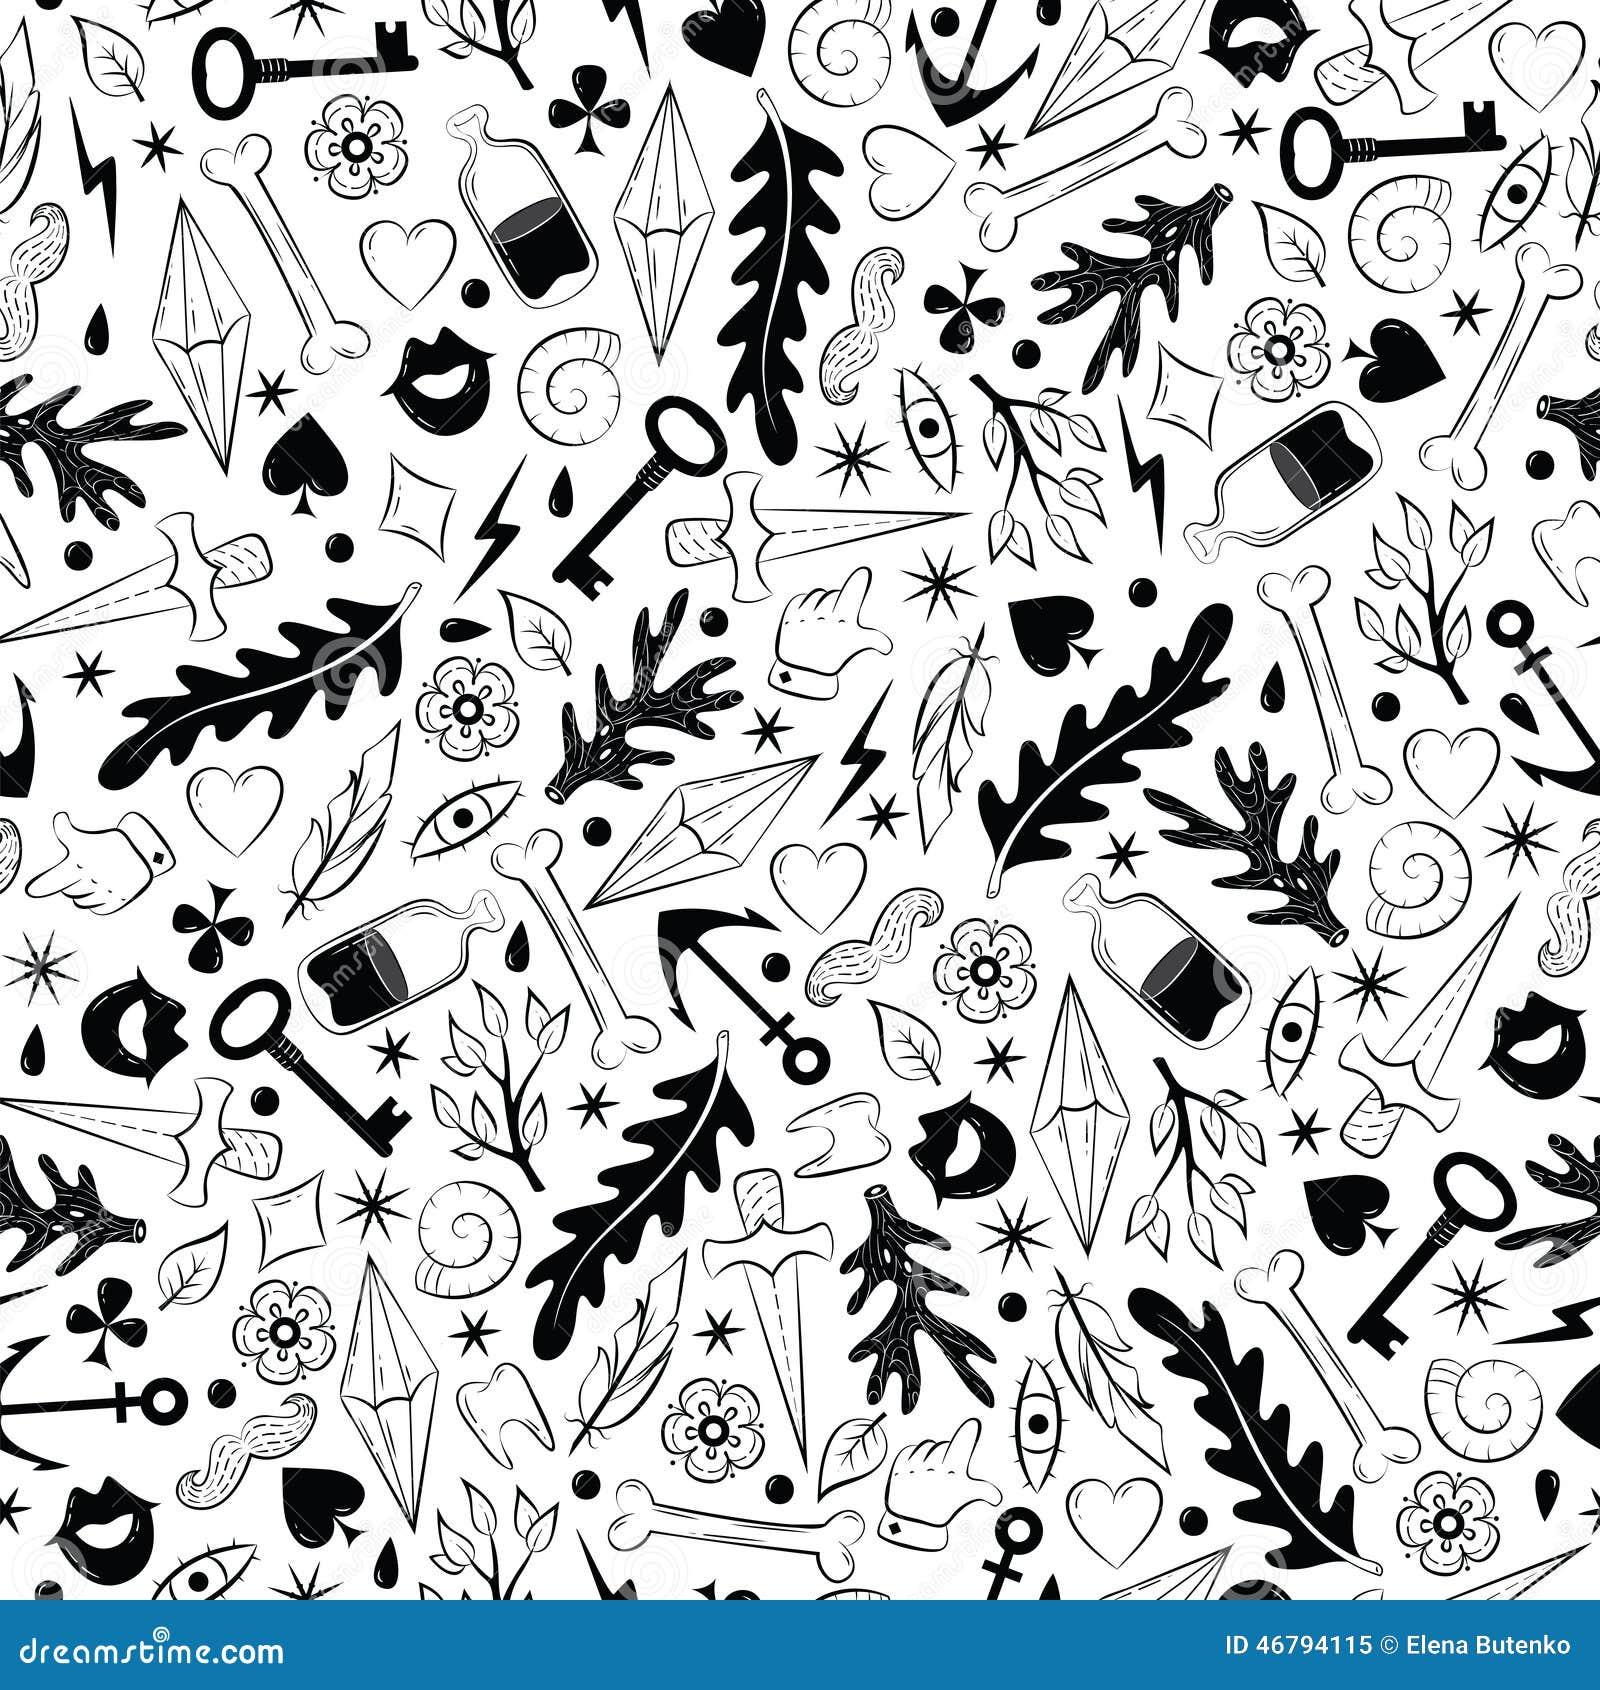 Old School Tattoo Stock Vector Illustration Of Artistic 46794115